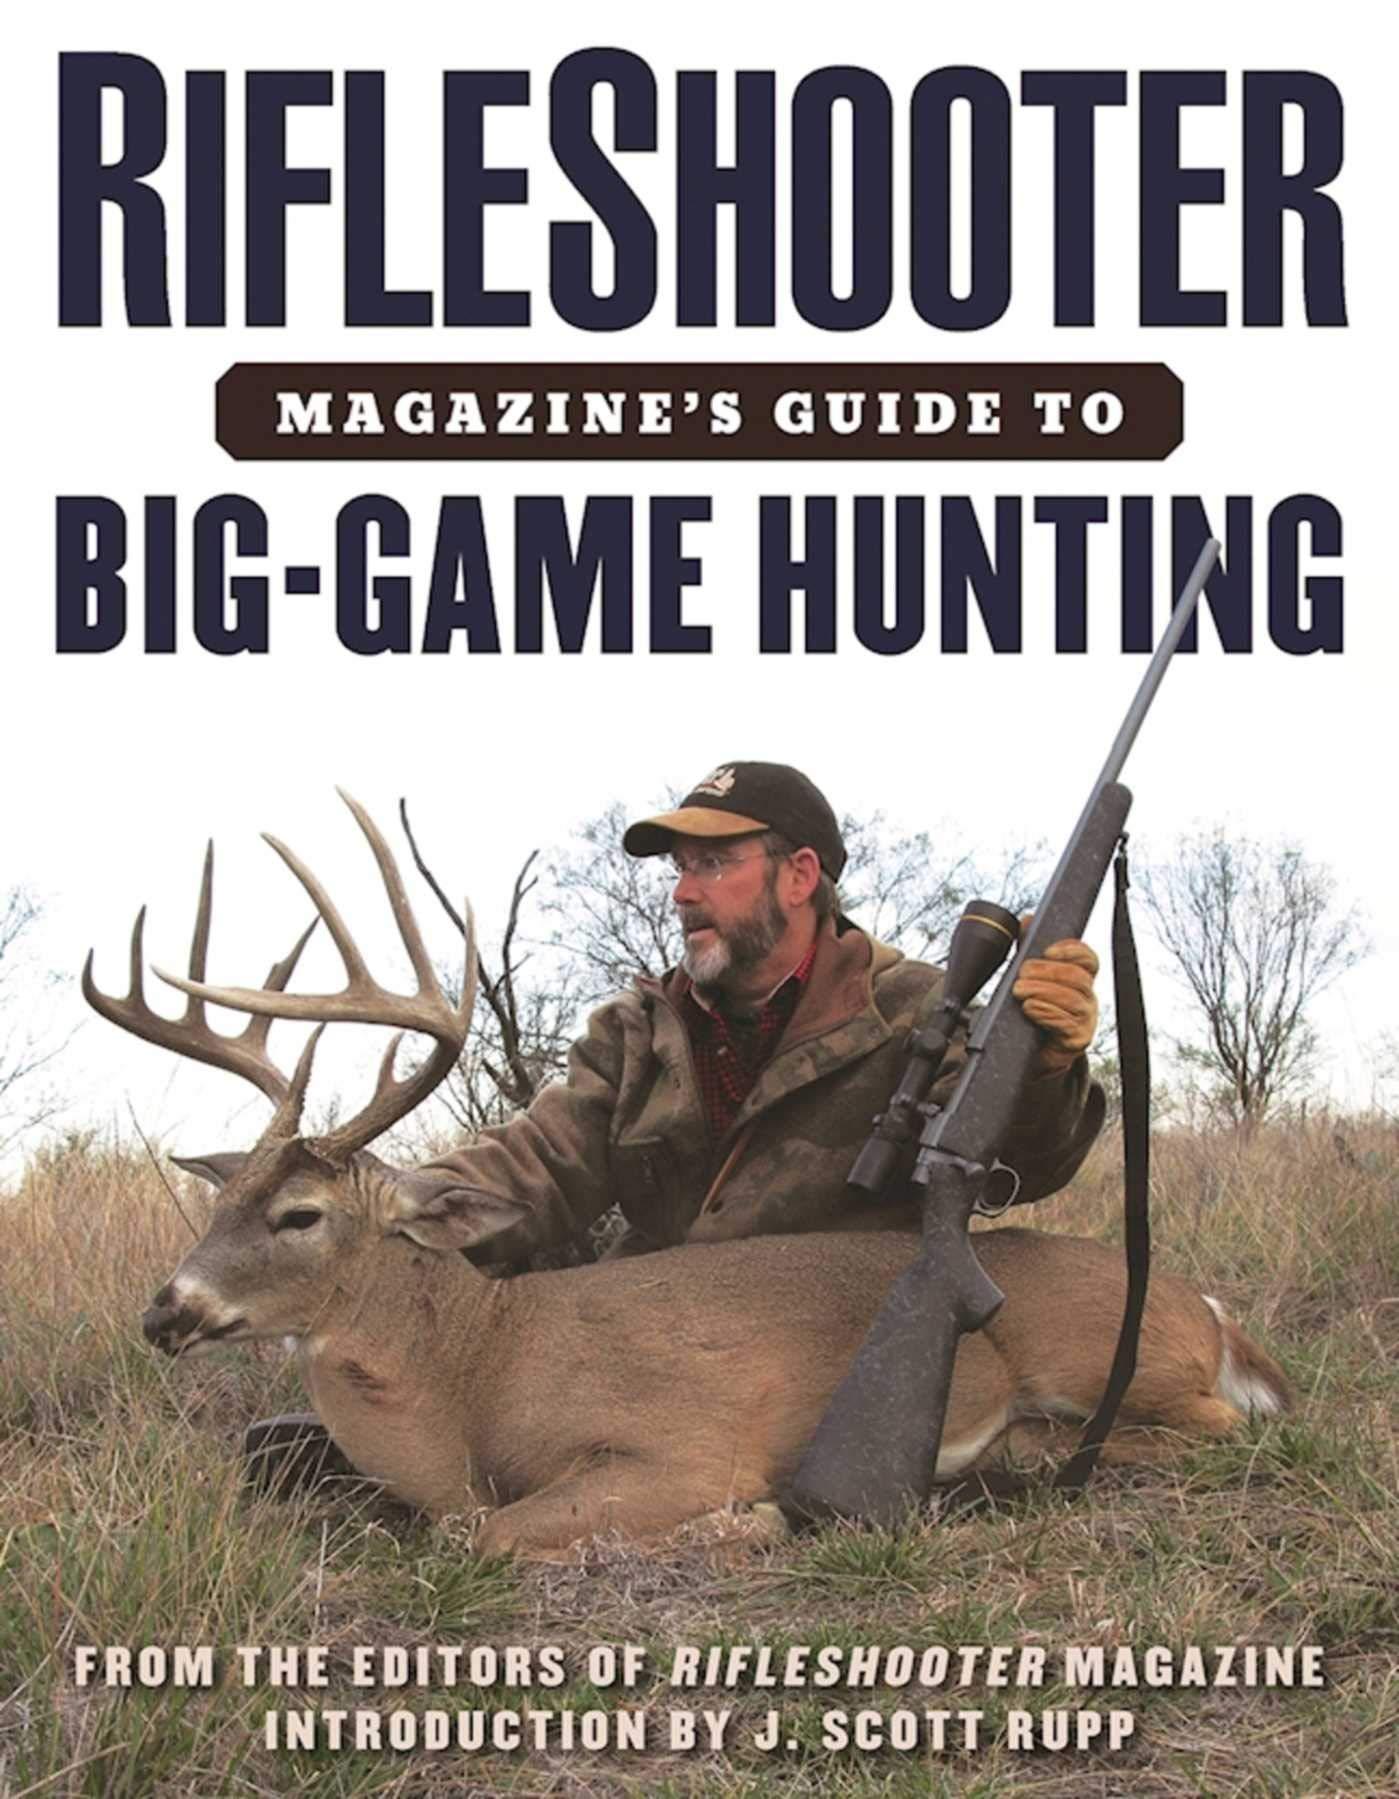 Amazon com: RifleShooter Magazine's Guide to Big-Game